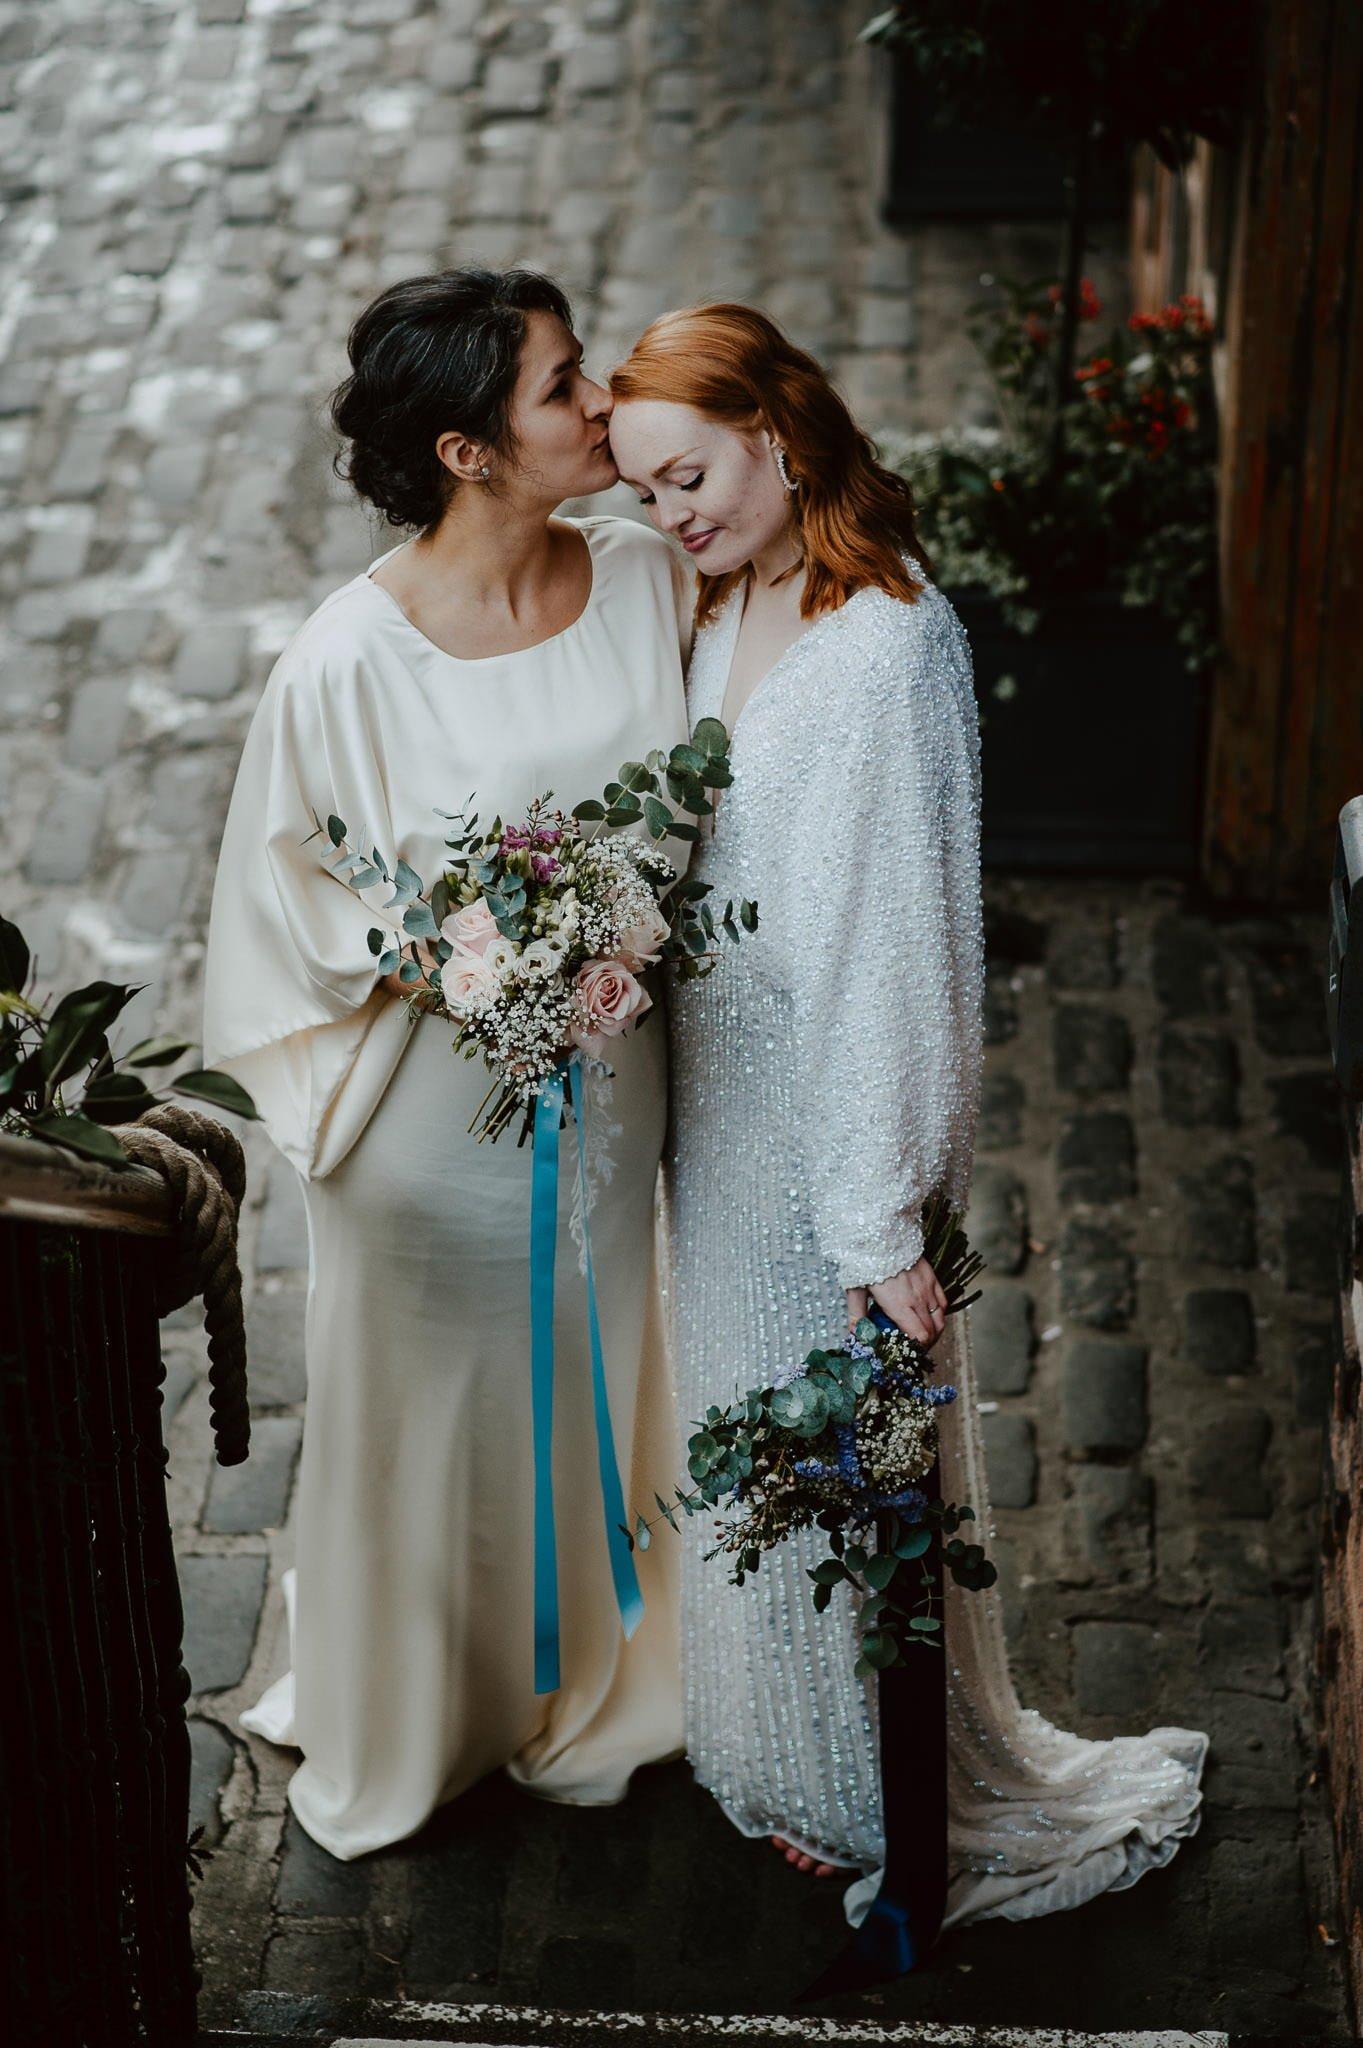 A Dreamy Pre-Raphaelite Wedding at the Bothy in Glasgow 39